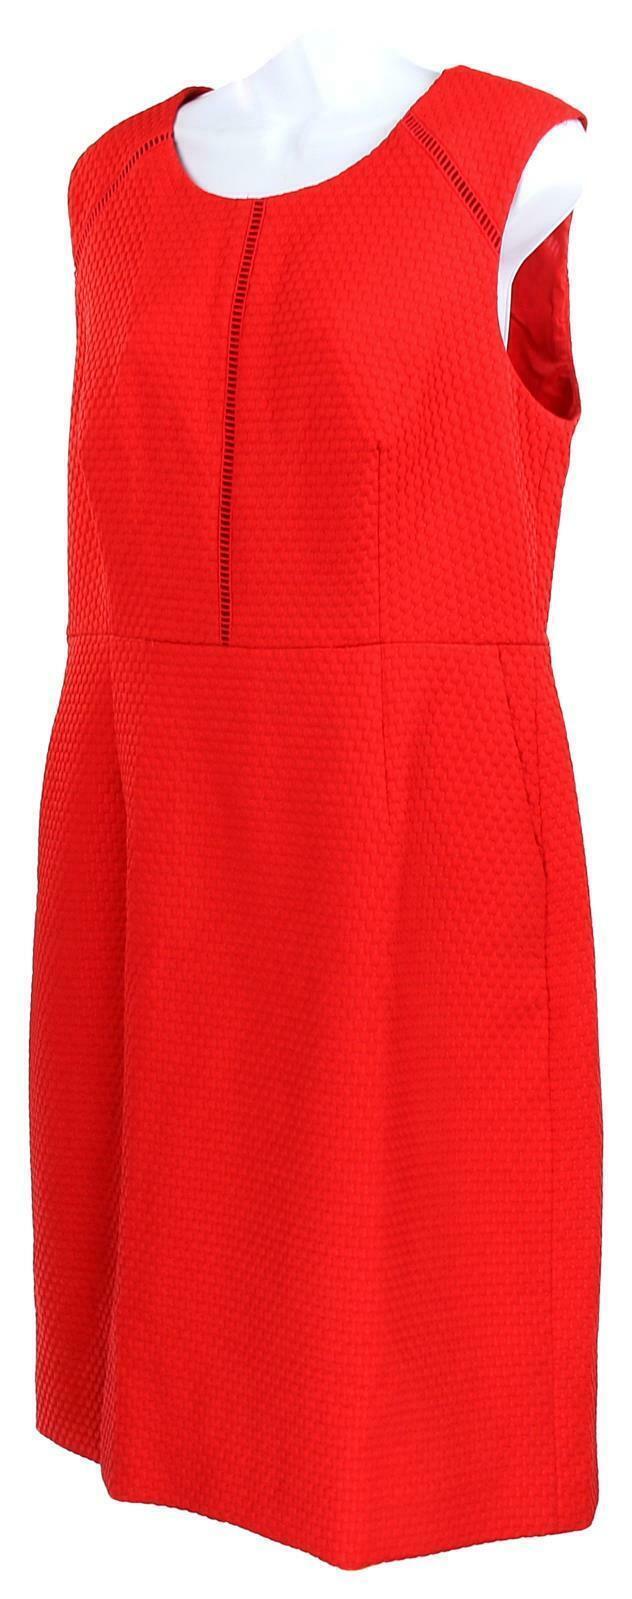 J Crew Women's Portfolio Sheath Dress /Suiting Career Work Red  12 F0791 image 3